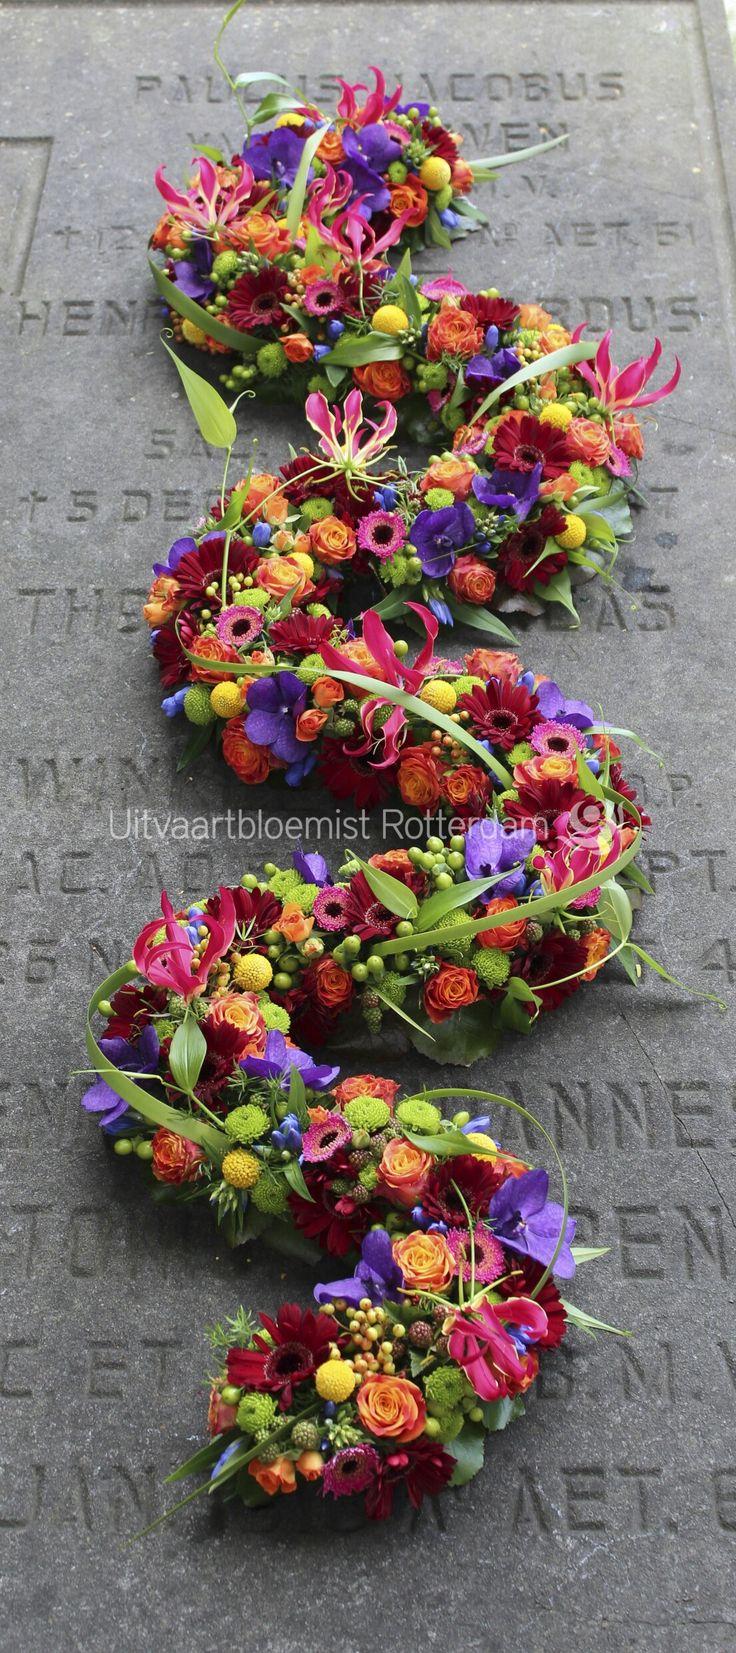 Uniek • bloemenslinger • kistbedekking • kleurrijk • rouwstuk • rouwbloemwerk • Gloriosa • Vanda • Santini • Craspedia • Gerbera • Trosroos • Hypericum • Thypha •